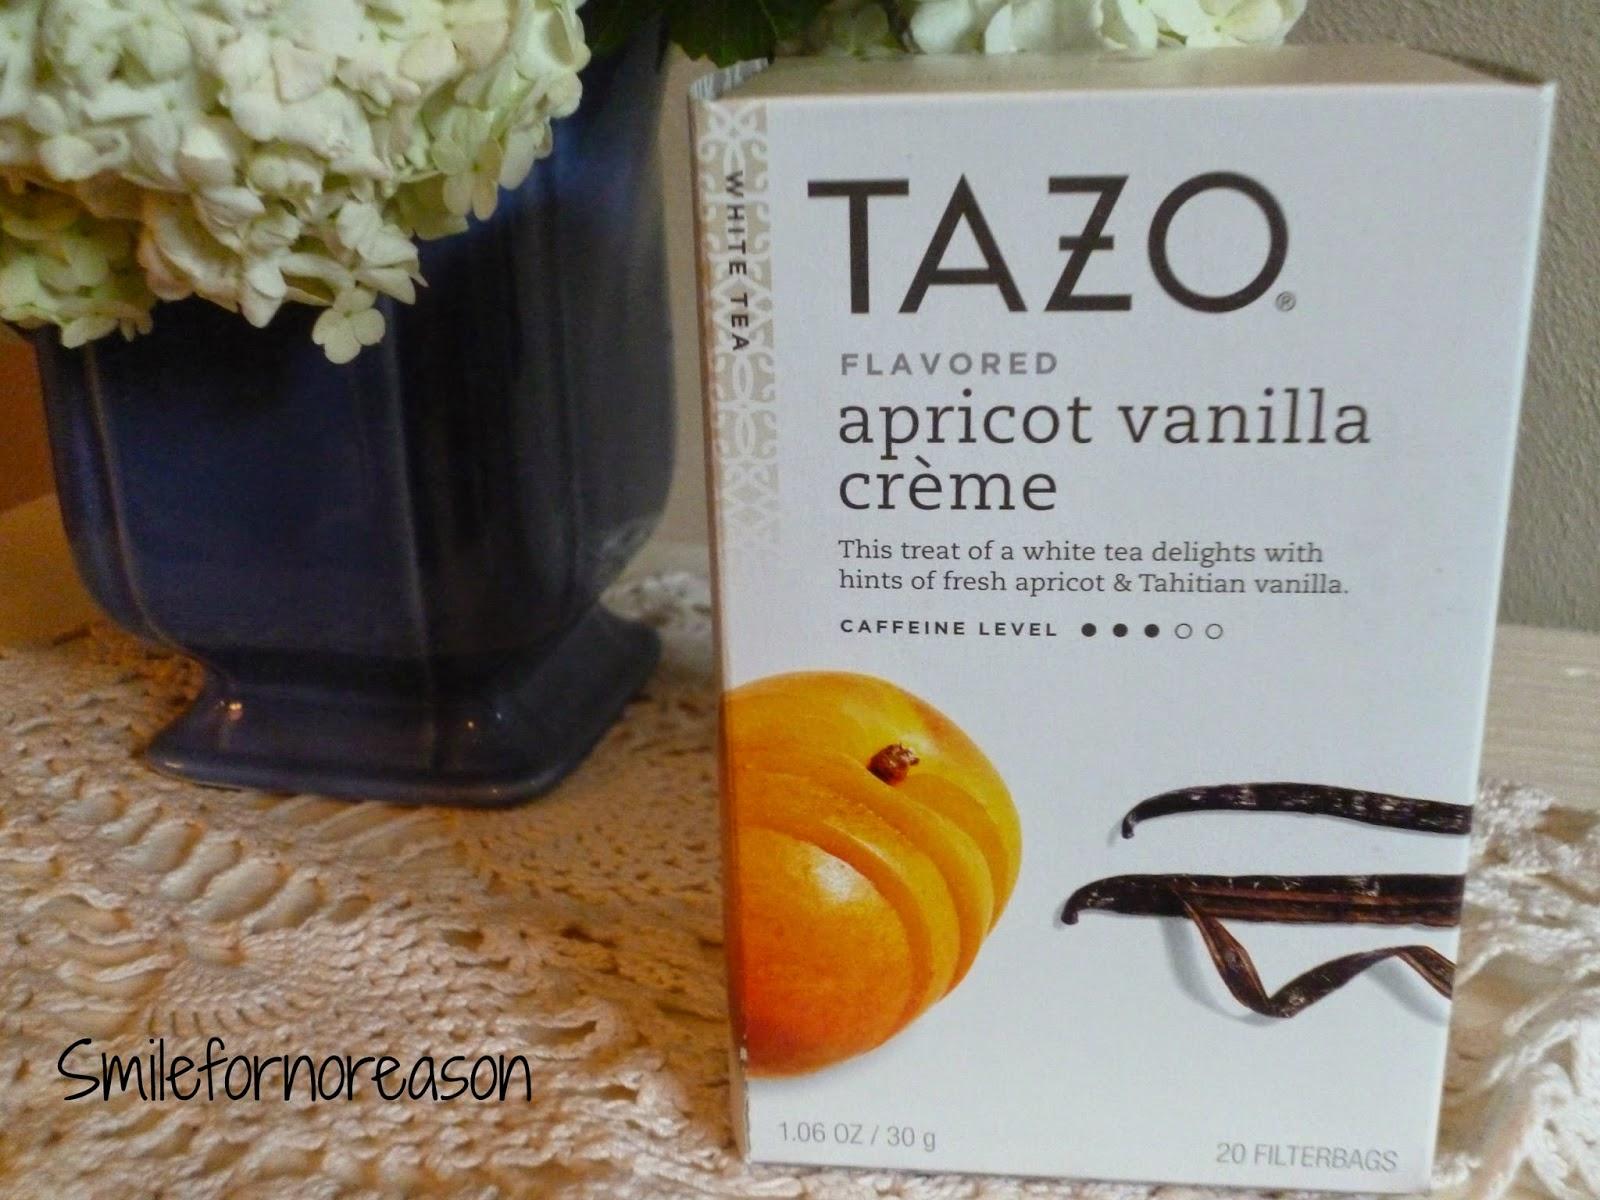 Tazo apricot tea